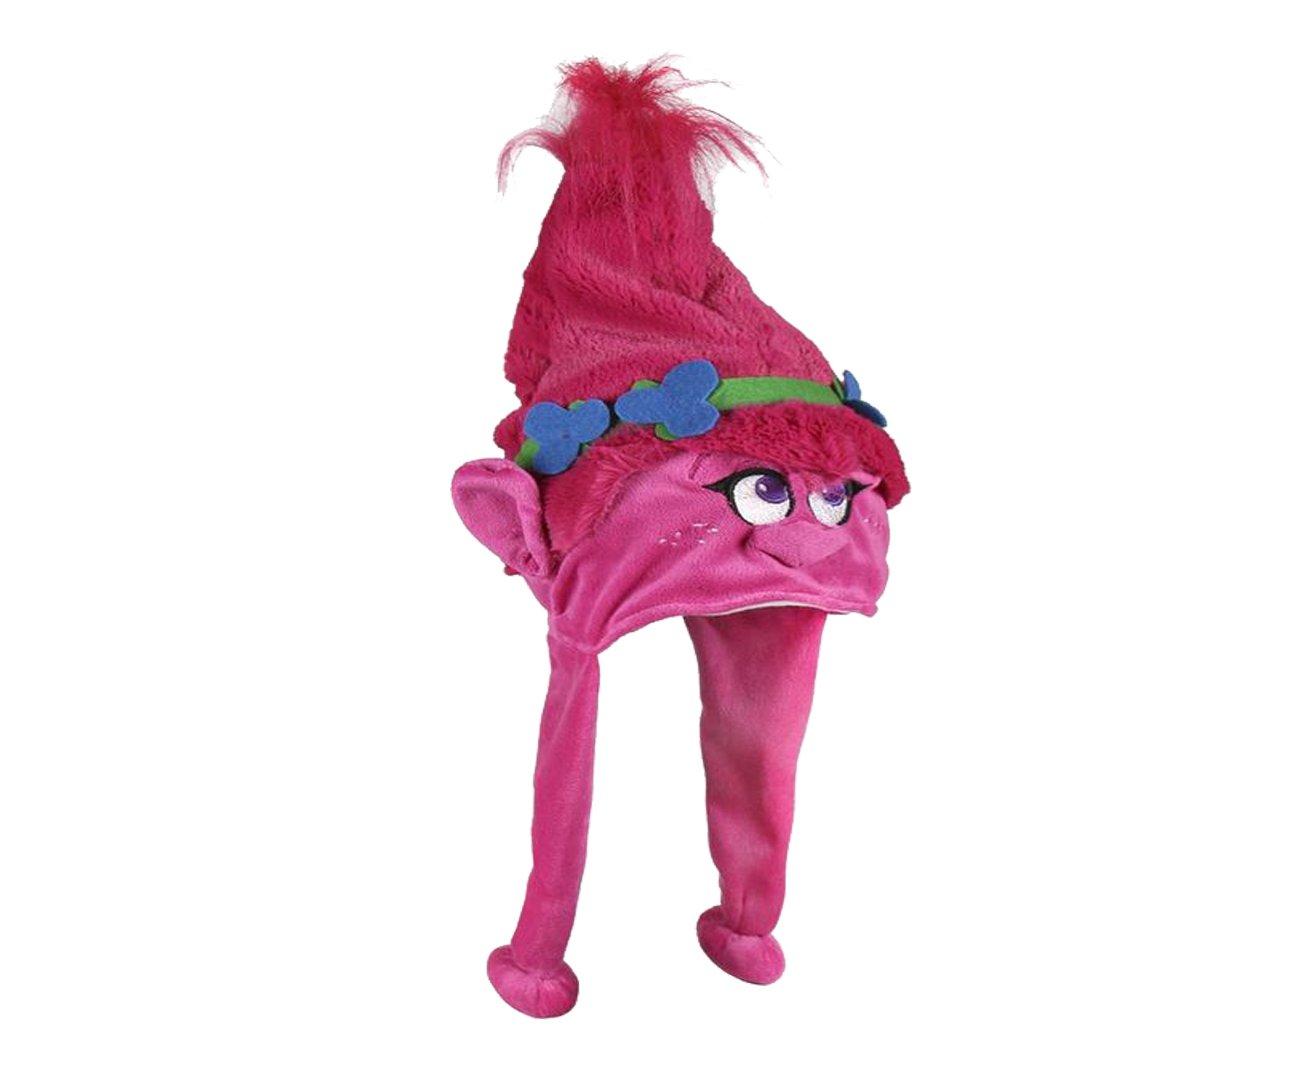 Made in Trade-trolls gorro 3d, unisex infantil, 2200002533, talla única Cerda